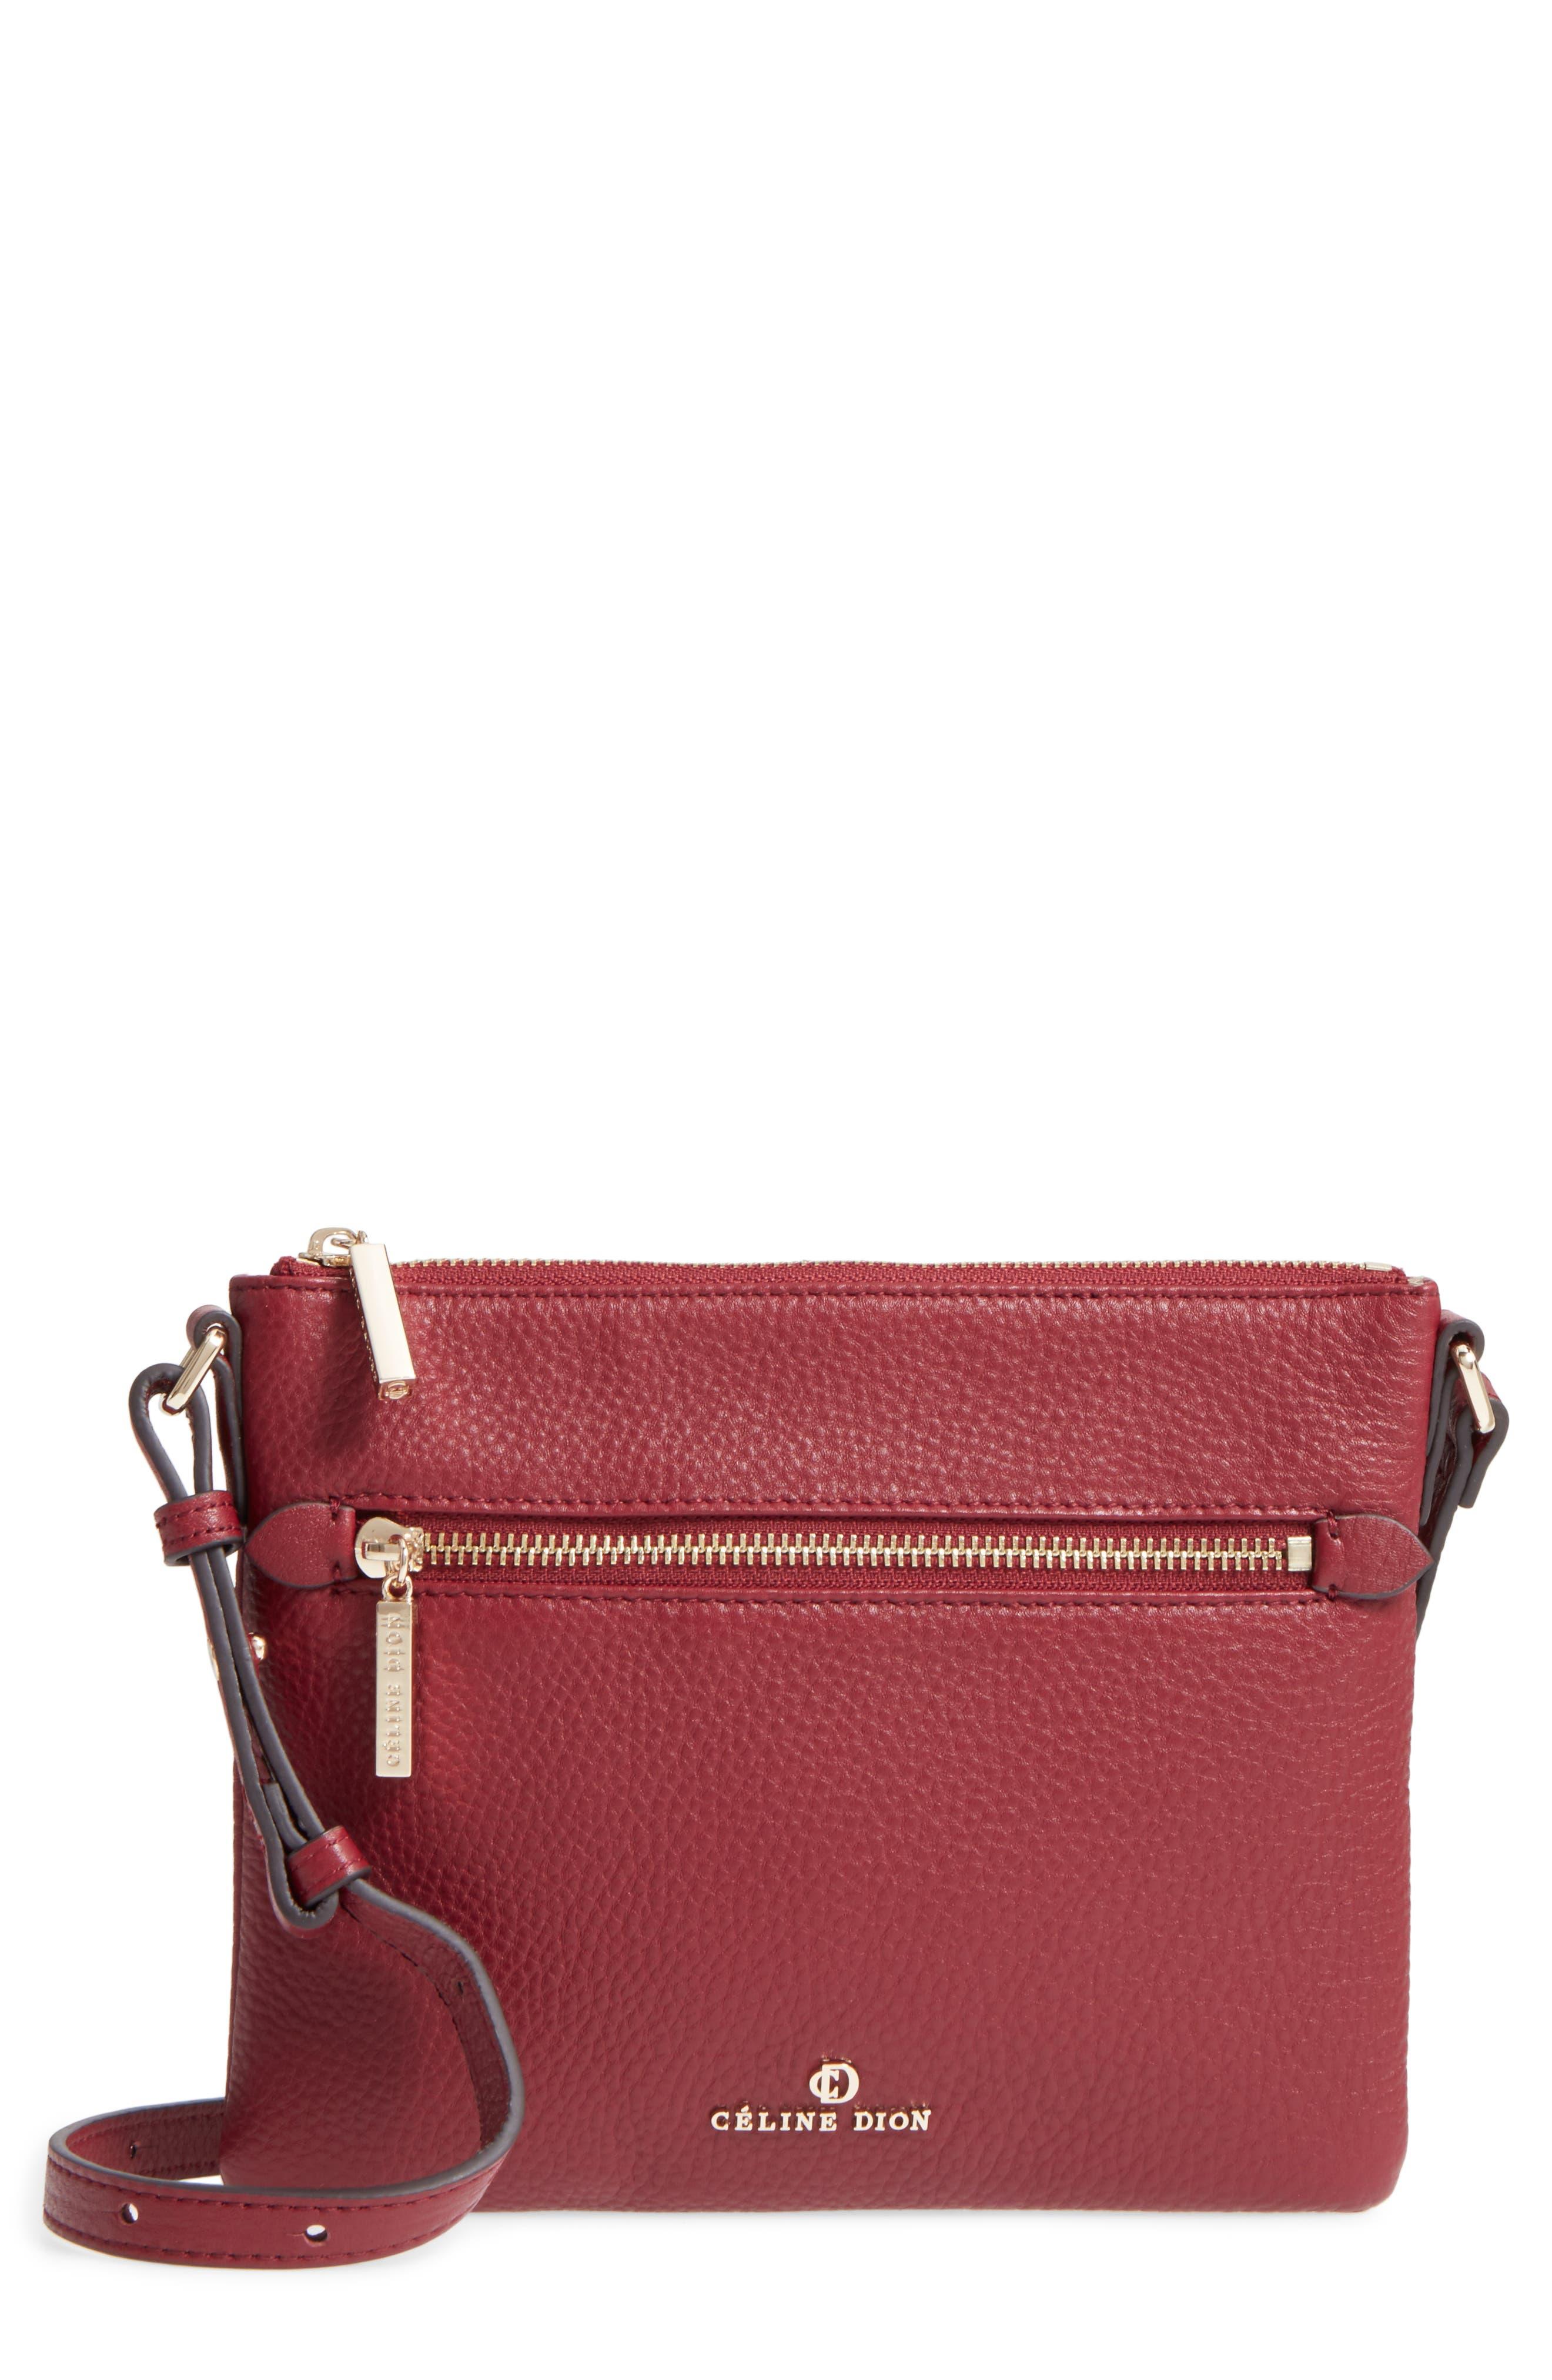 Main Image - Céline Dion Adagio Leather Crossbody Bag